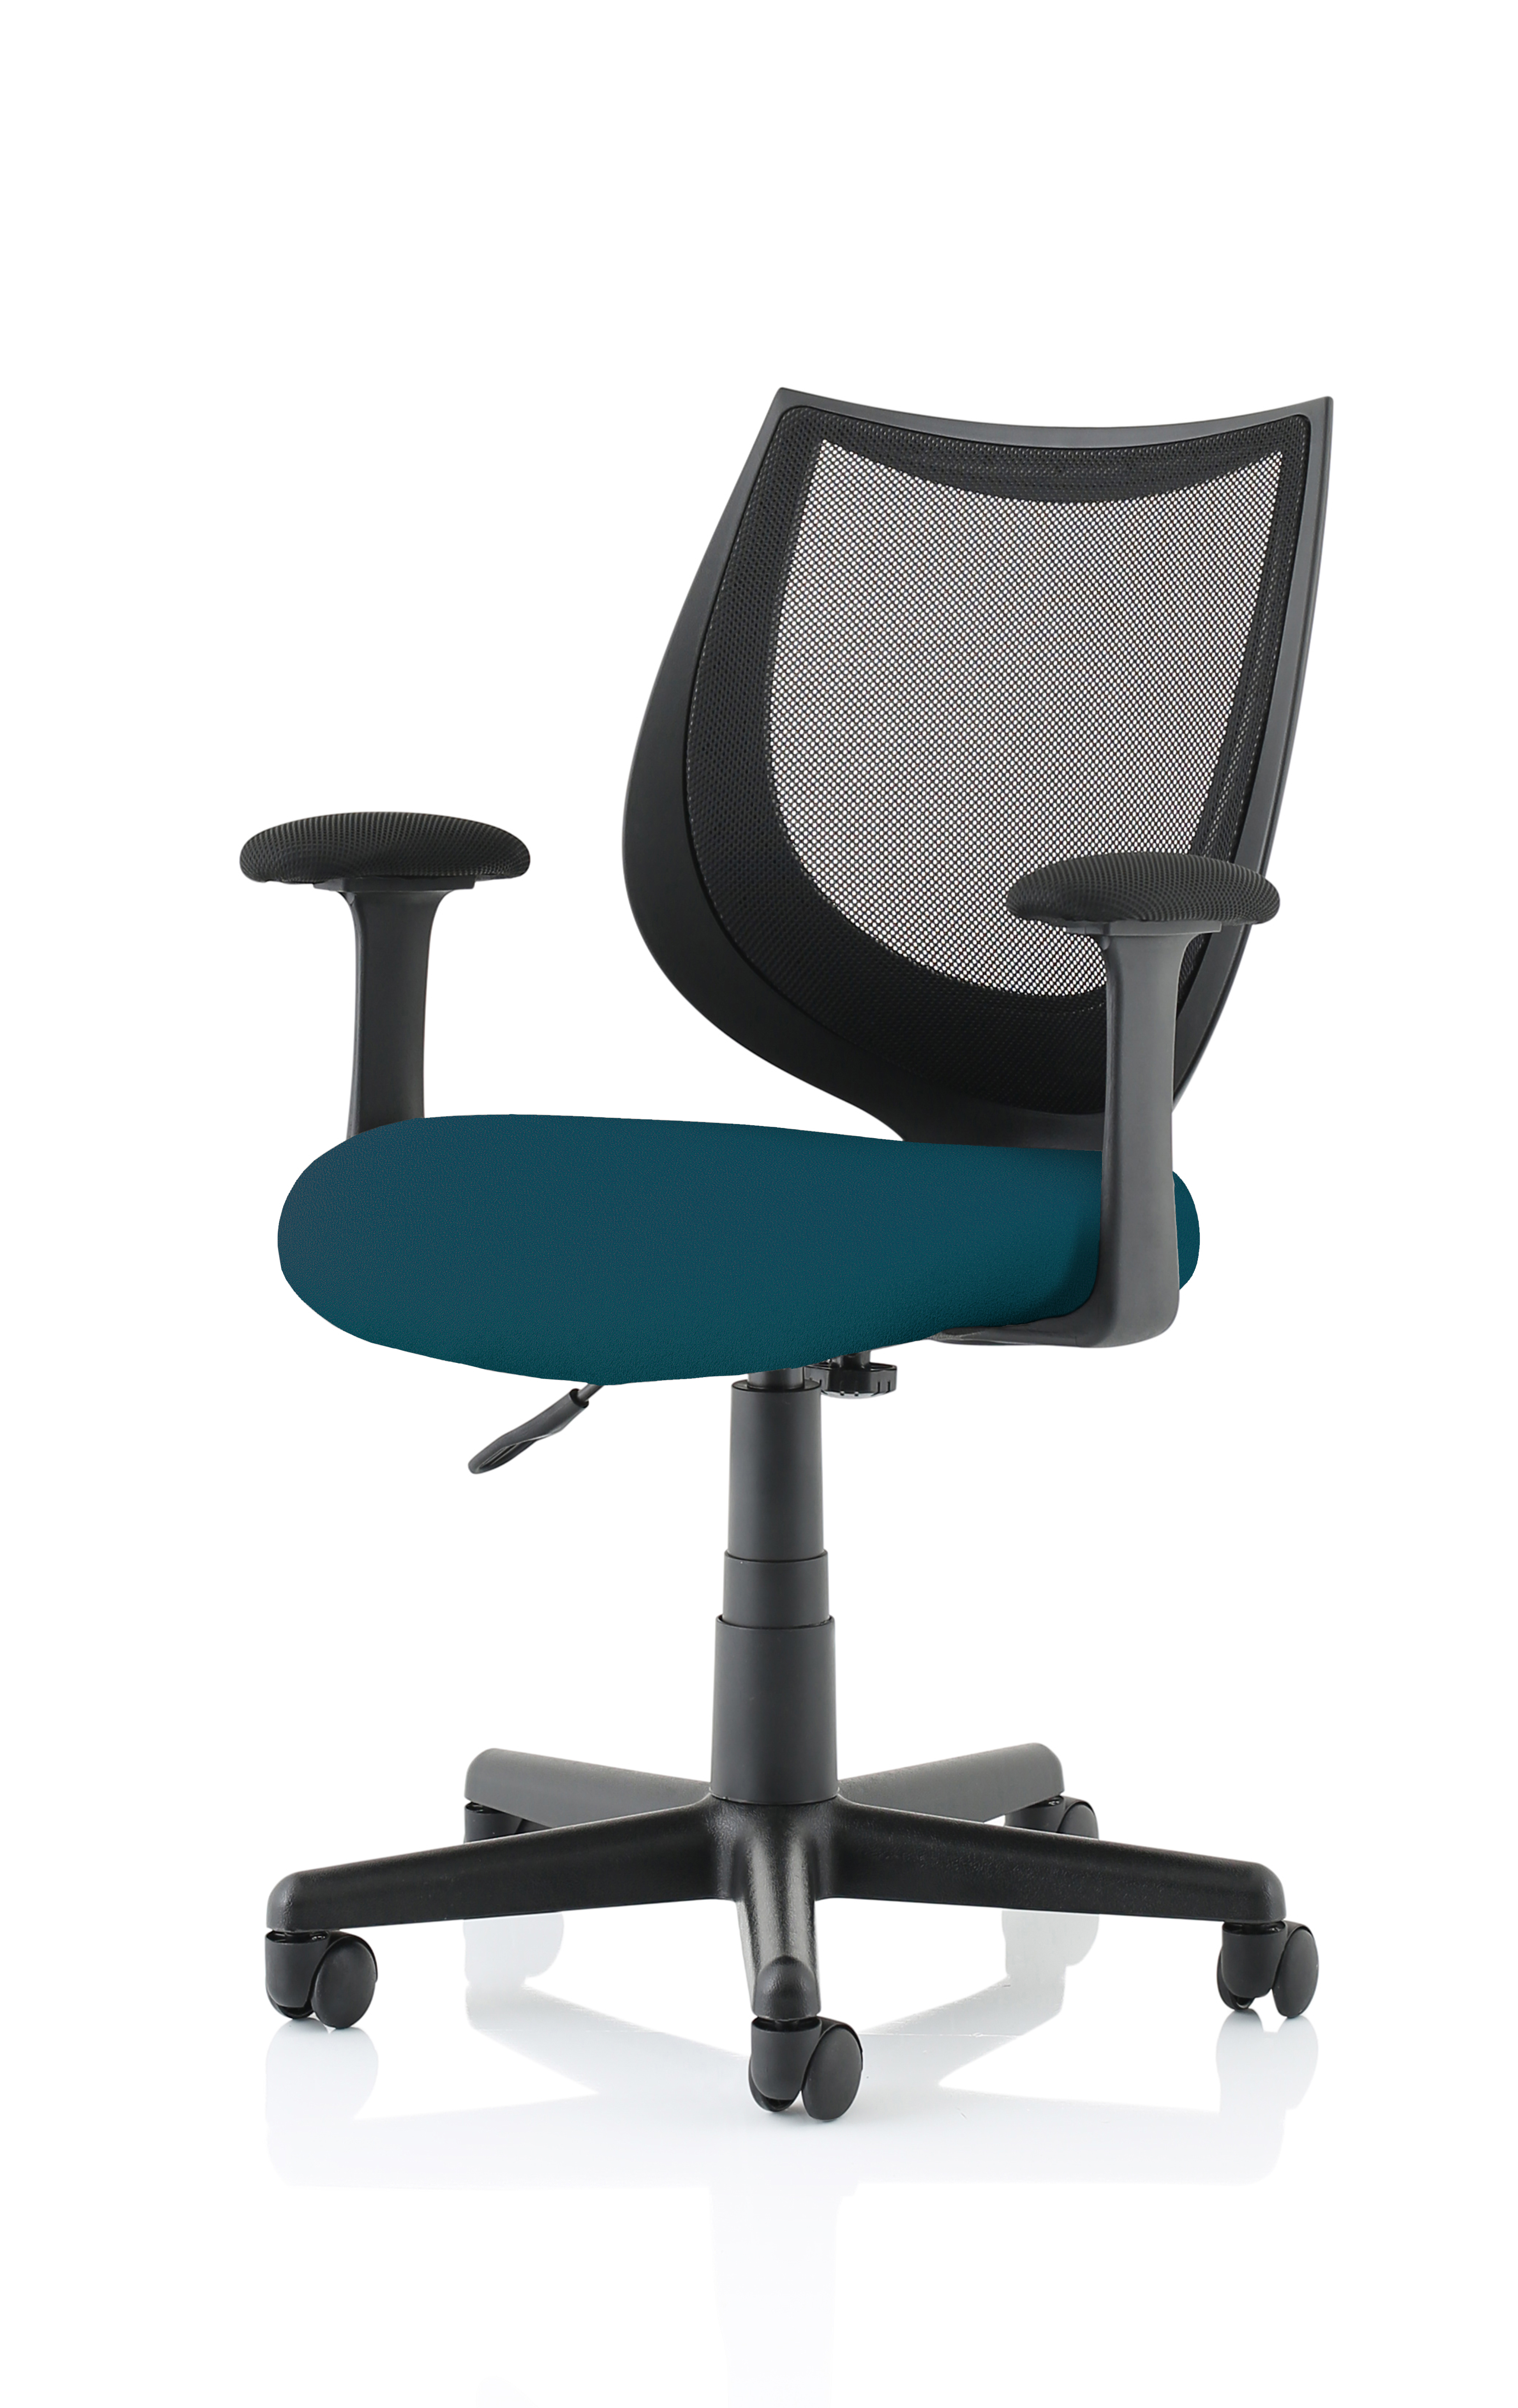 Camden Black Mesh Chair in Maringa Teal